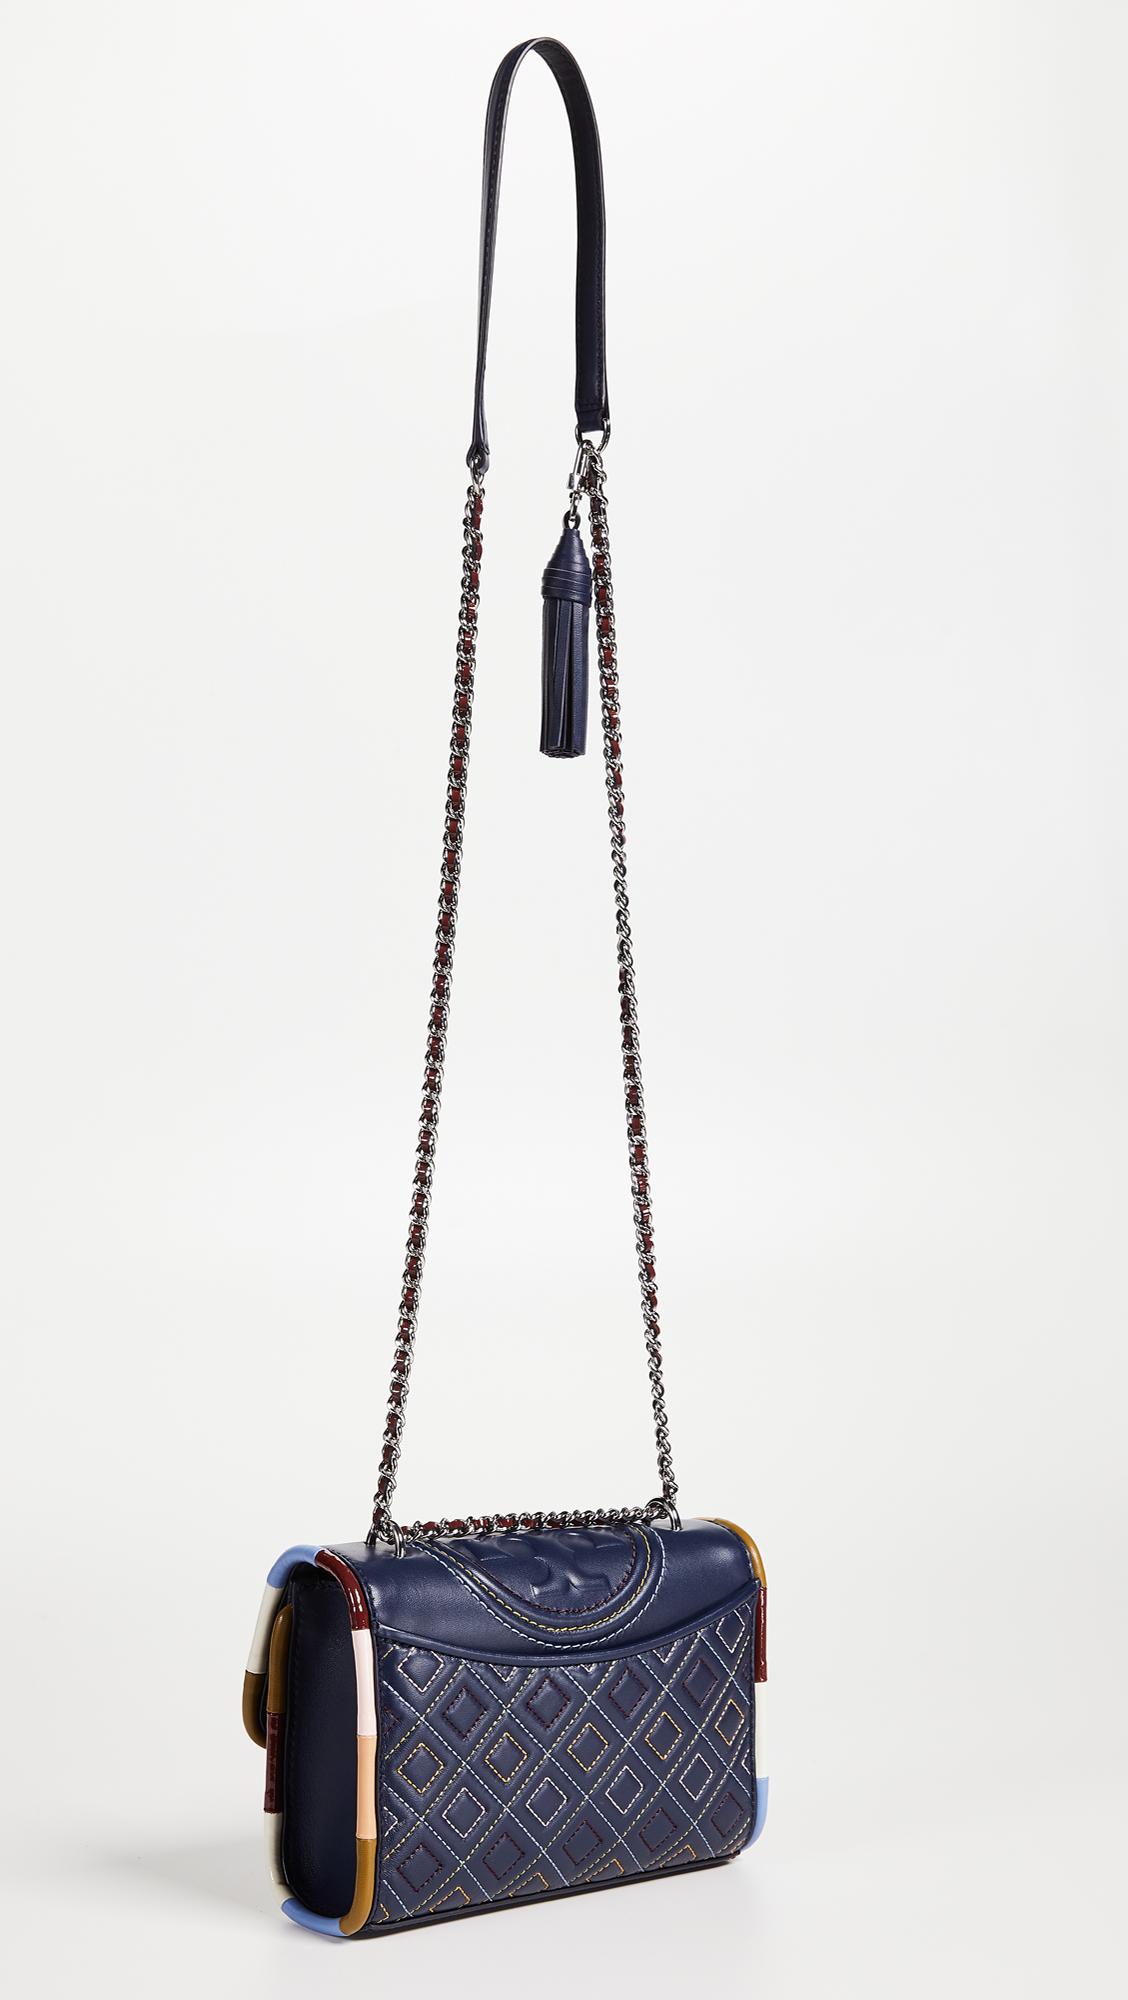 Tory Burch Fleming Small Shoulder Bag  f6f5889c9ddc5